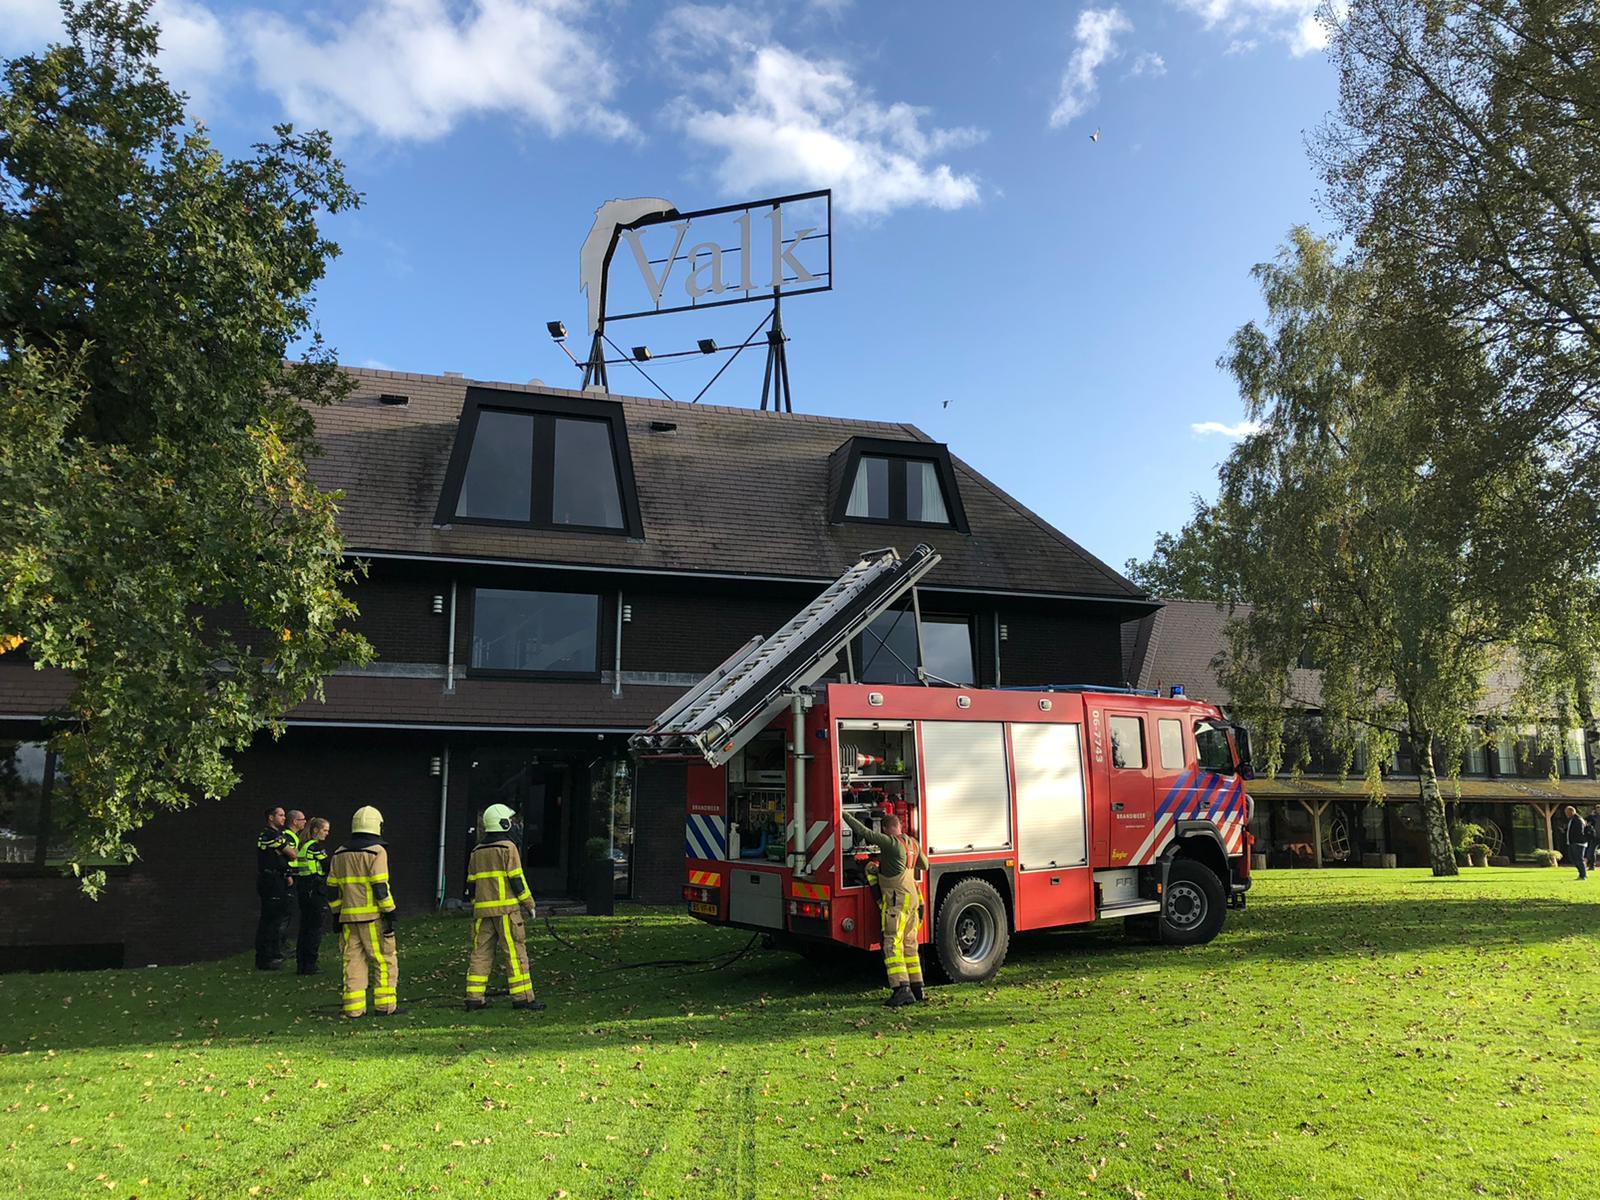 Brand bij Van der Valk Cantharel; pand werd snel ontruimd